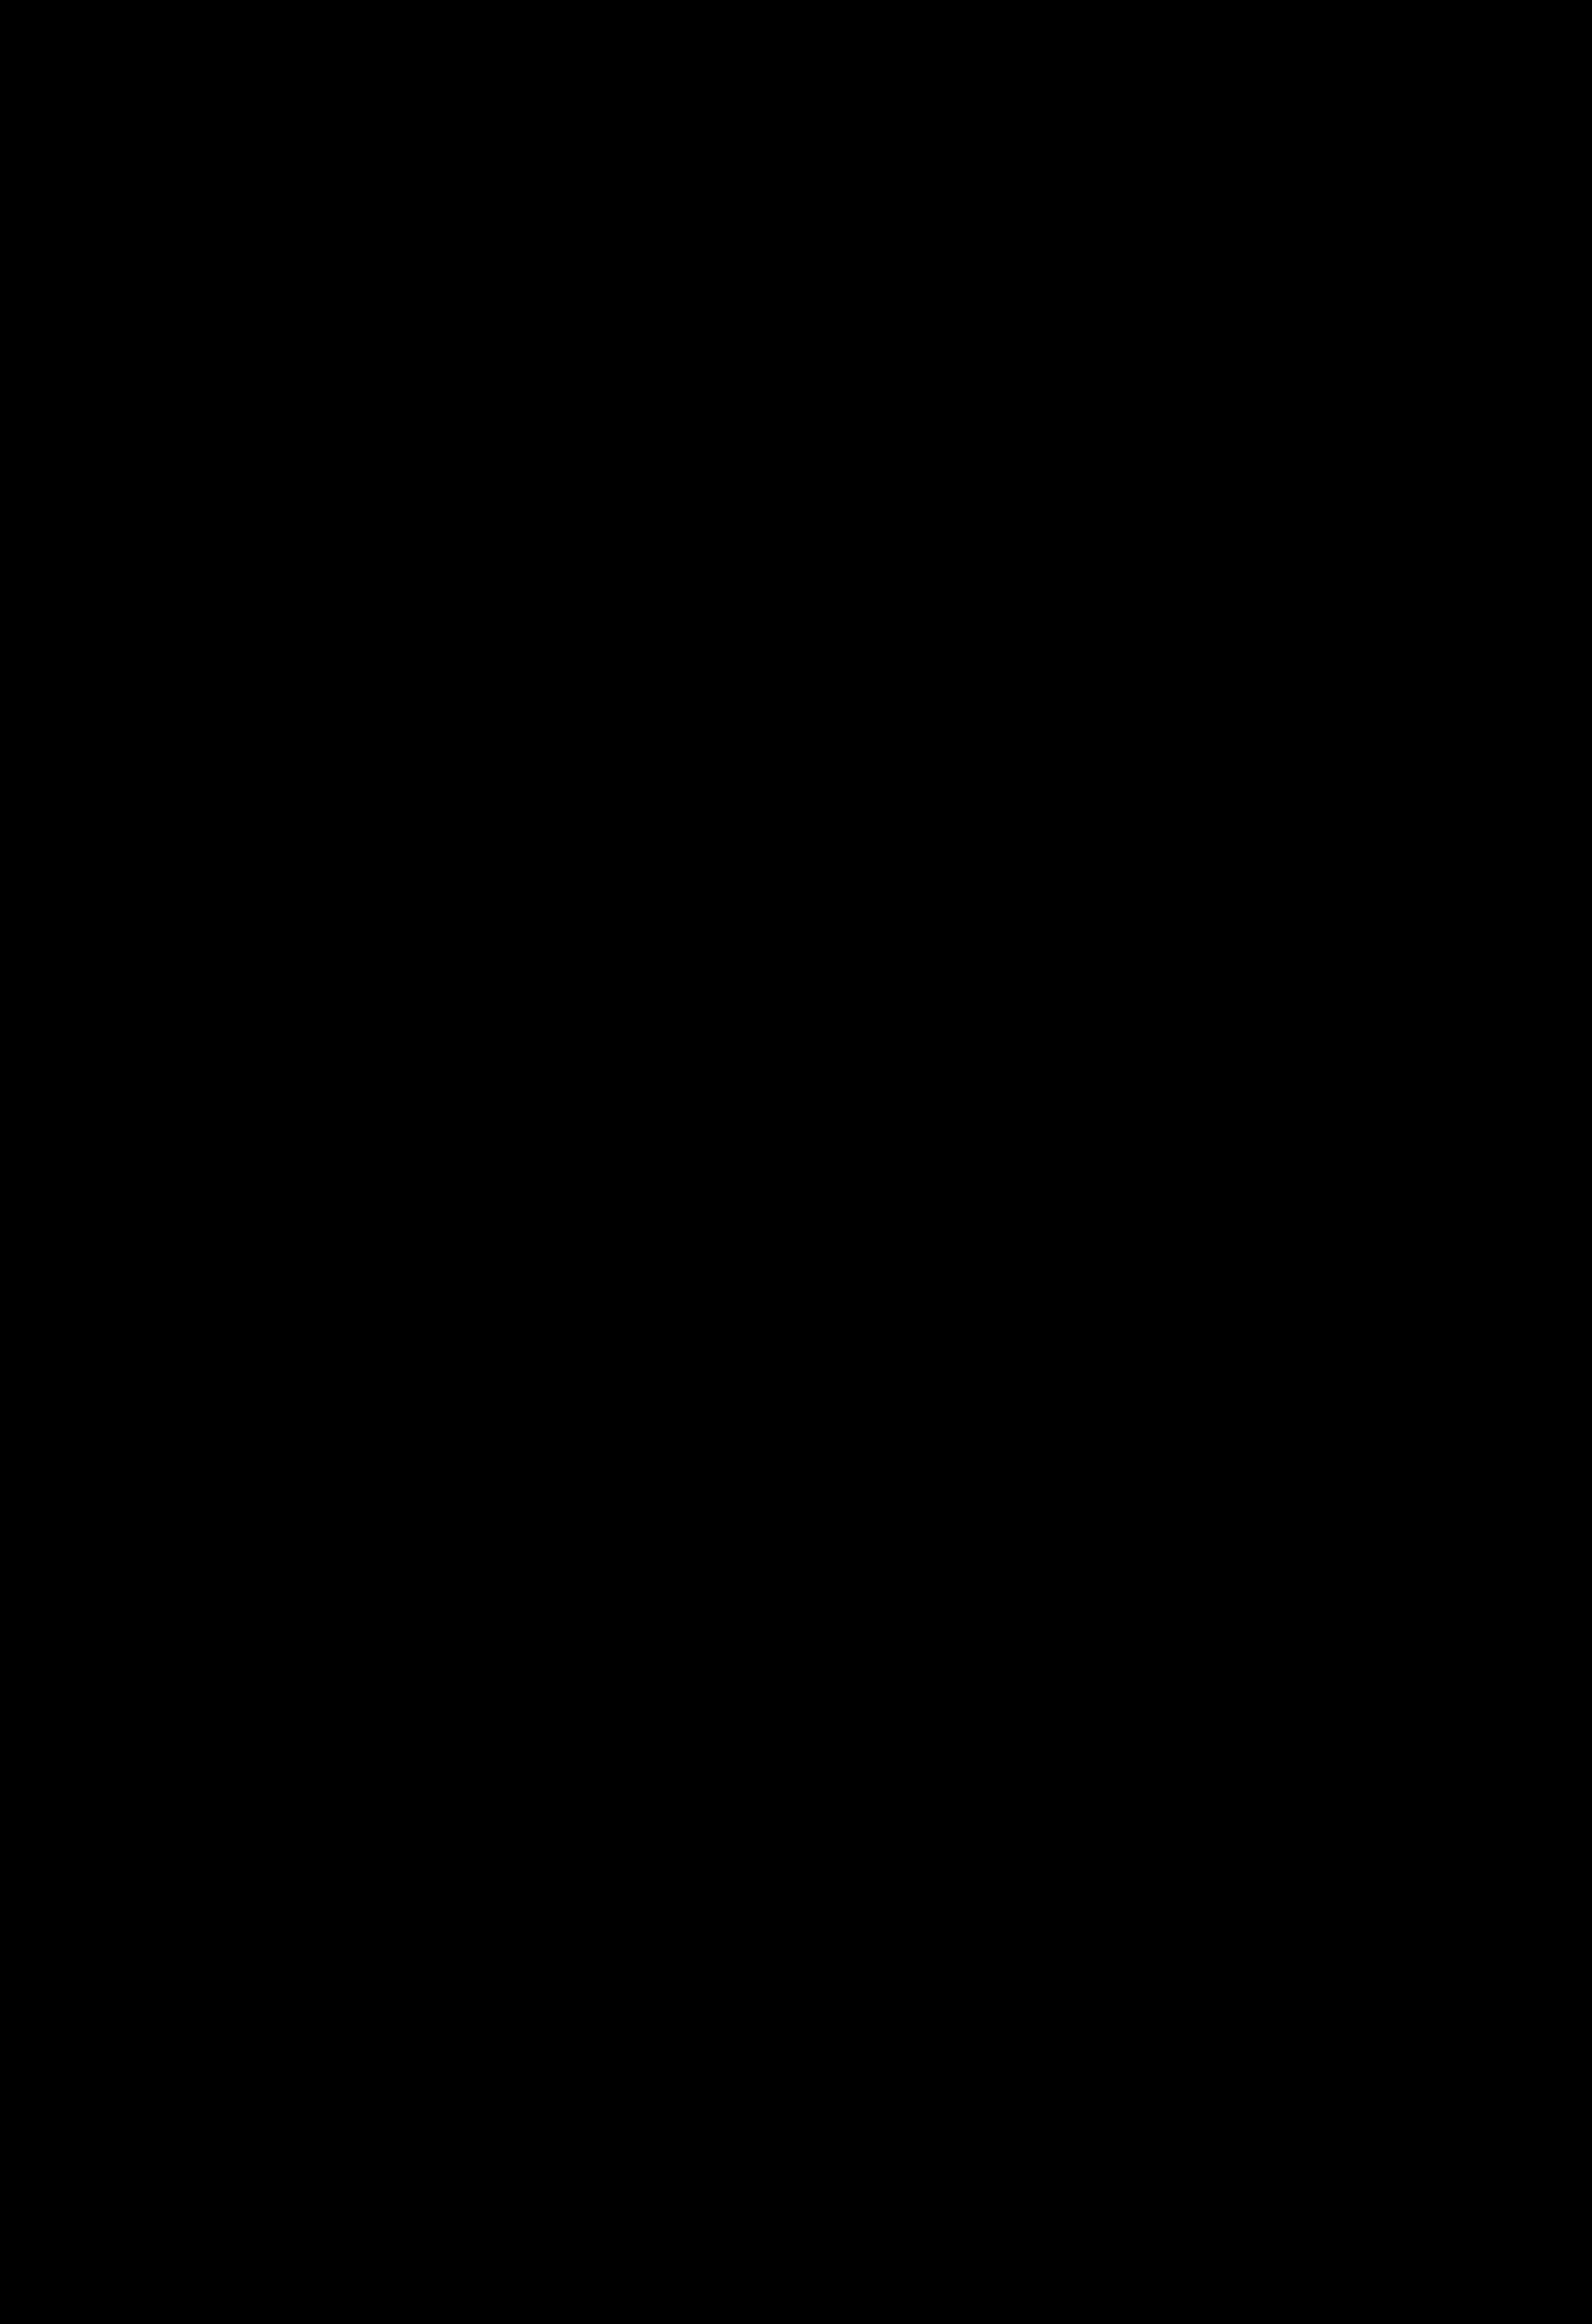 WCM0018.png